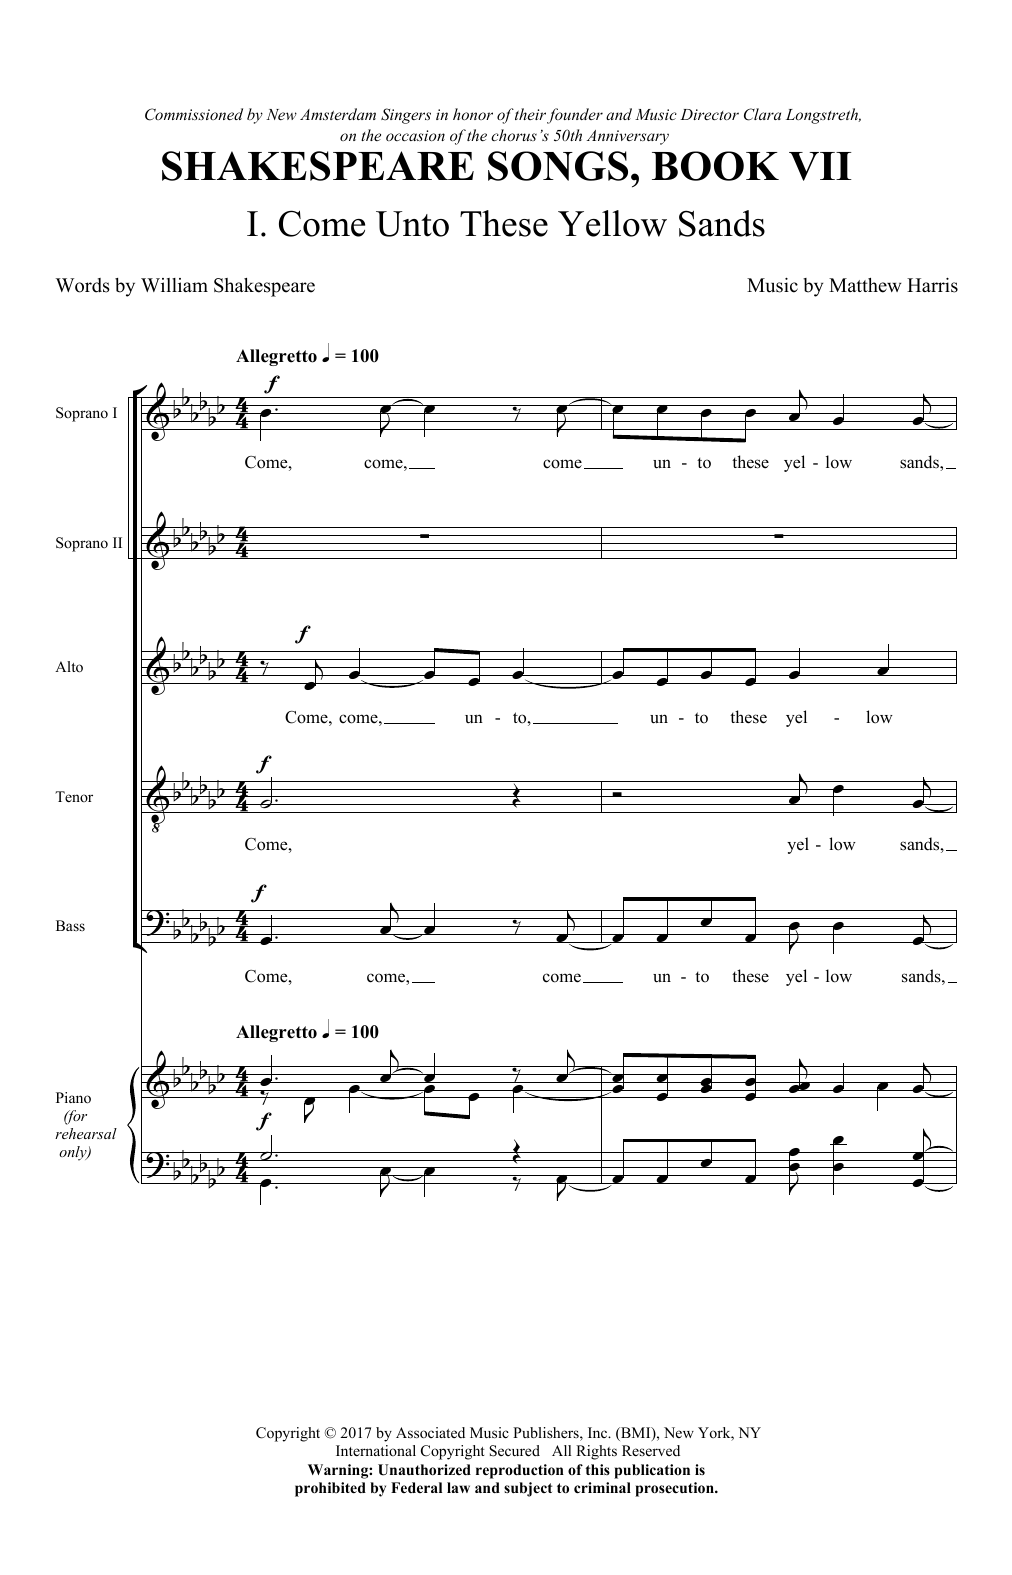 Come Unto These Yellow Sands (SATB Choir)